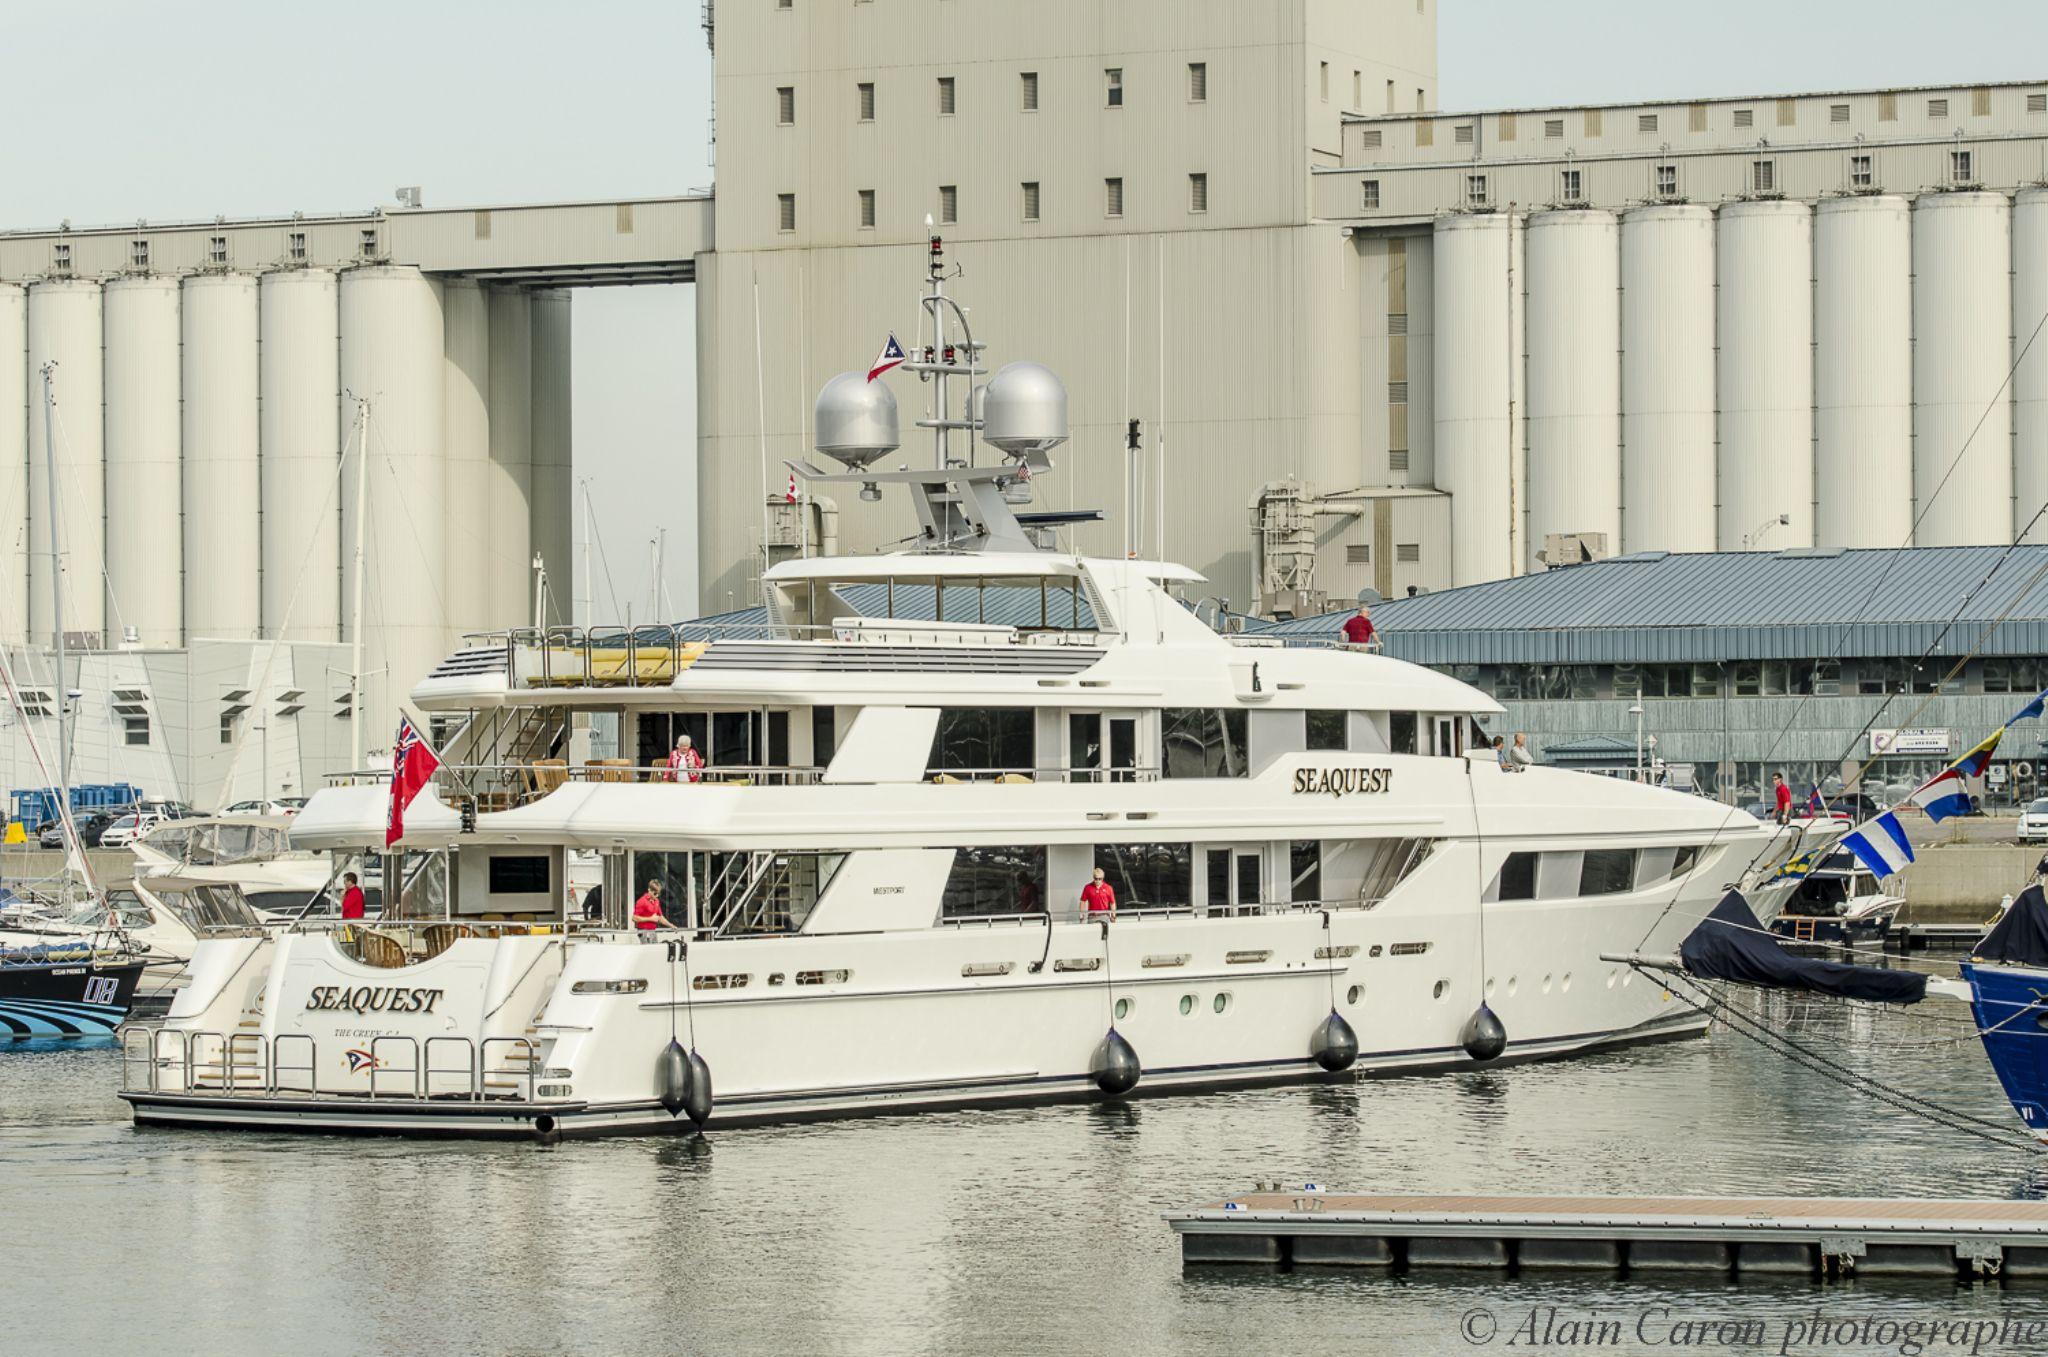 Seaquest fabulous cruiser by Allan Caron